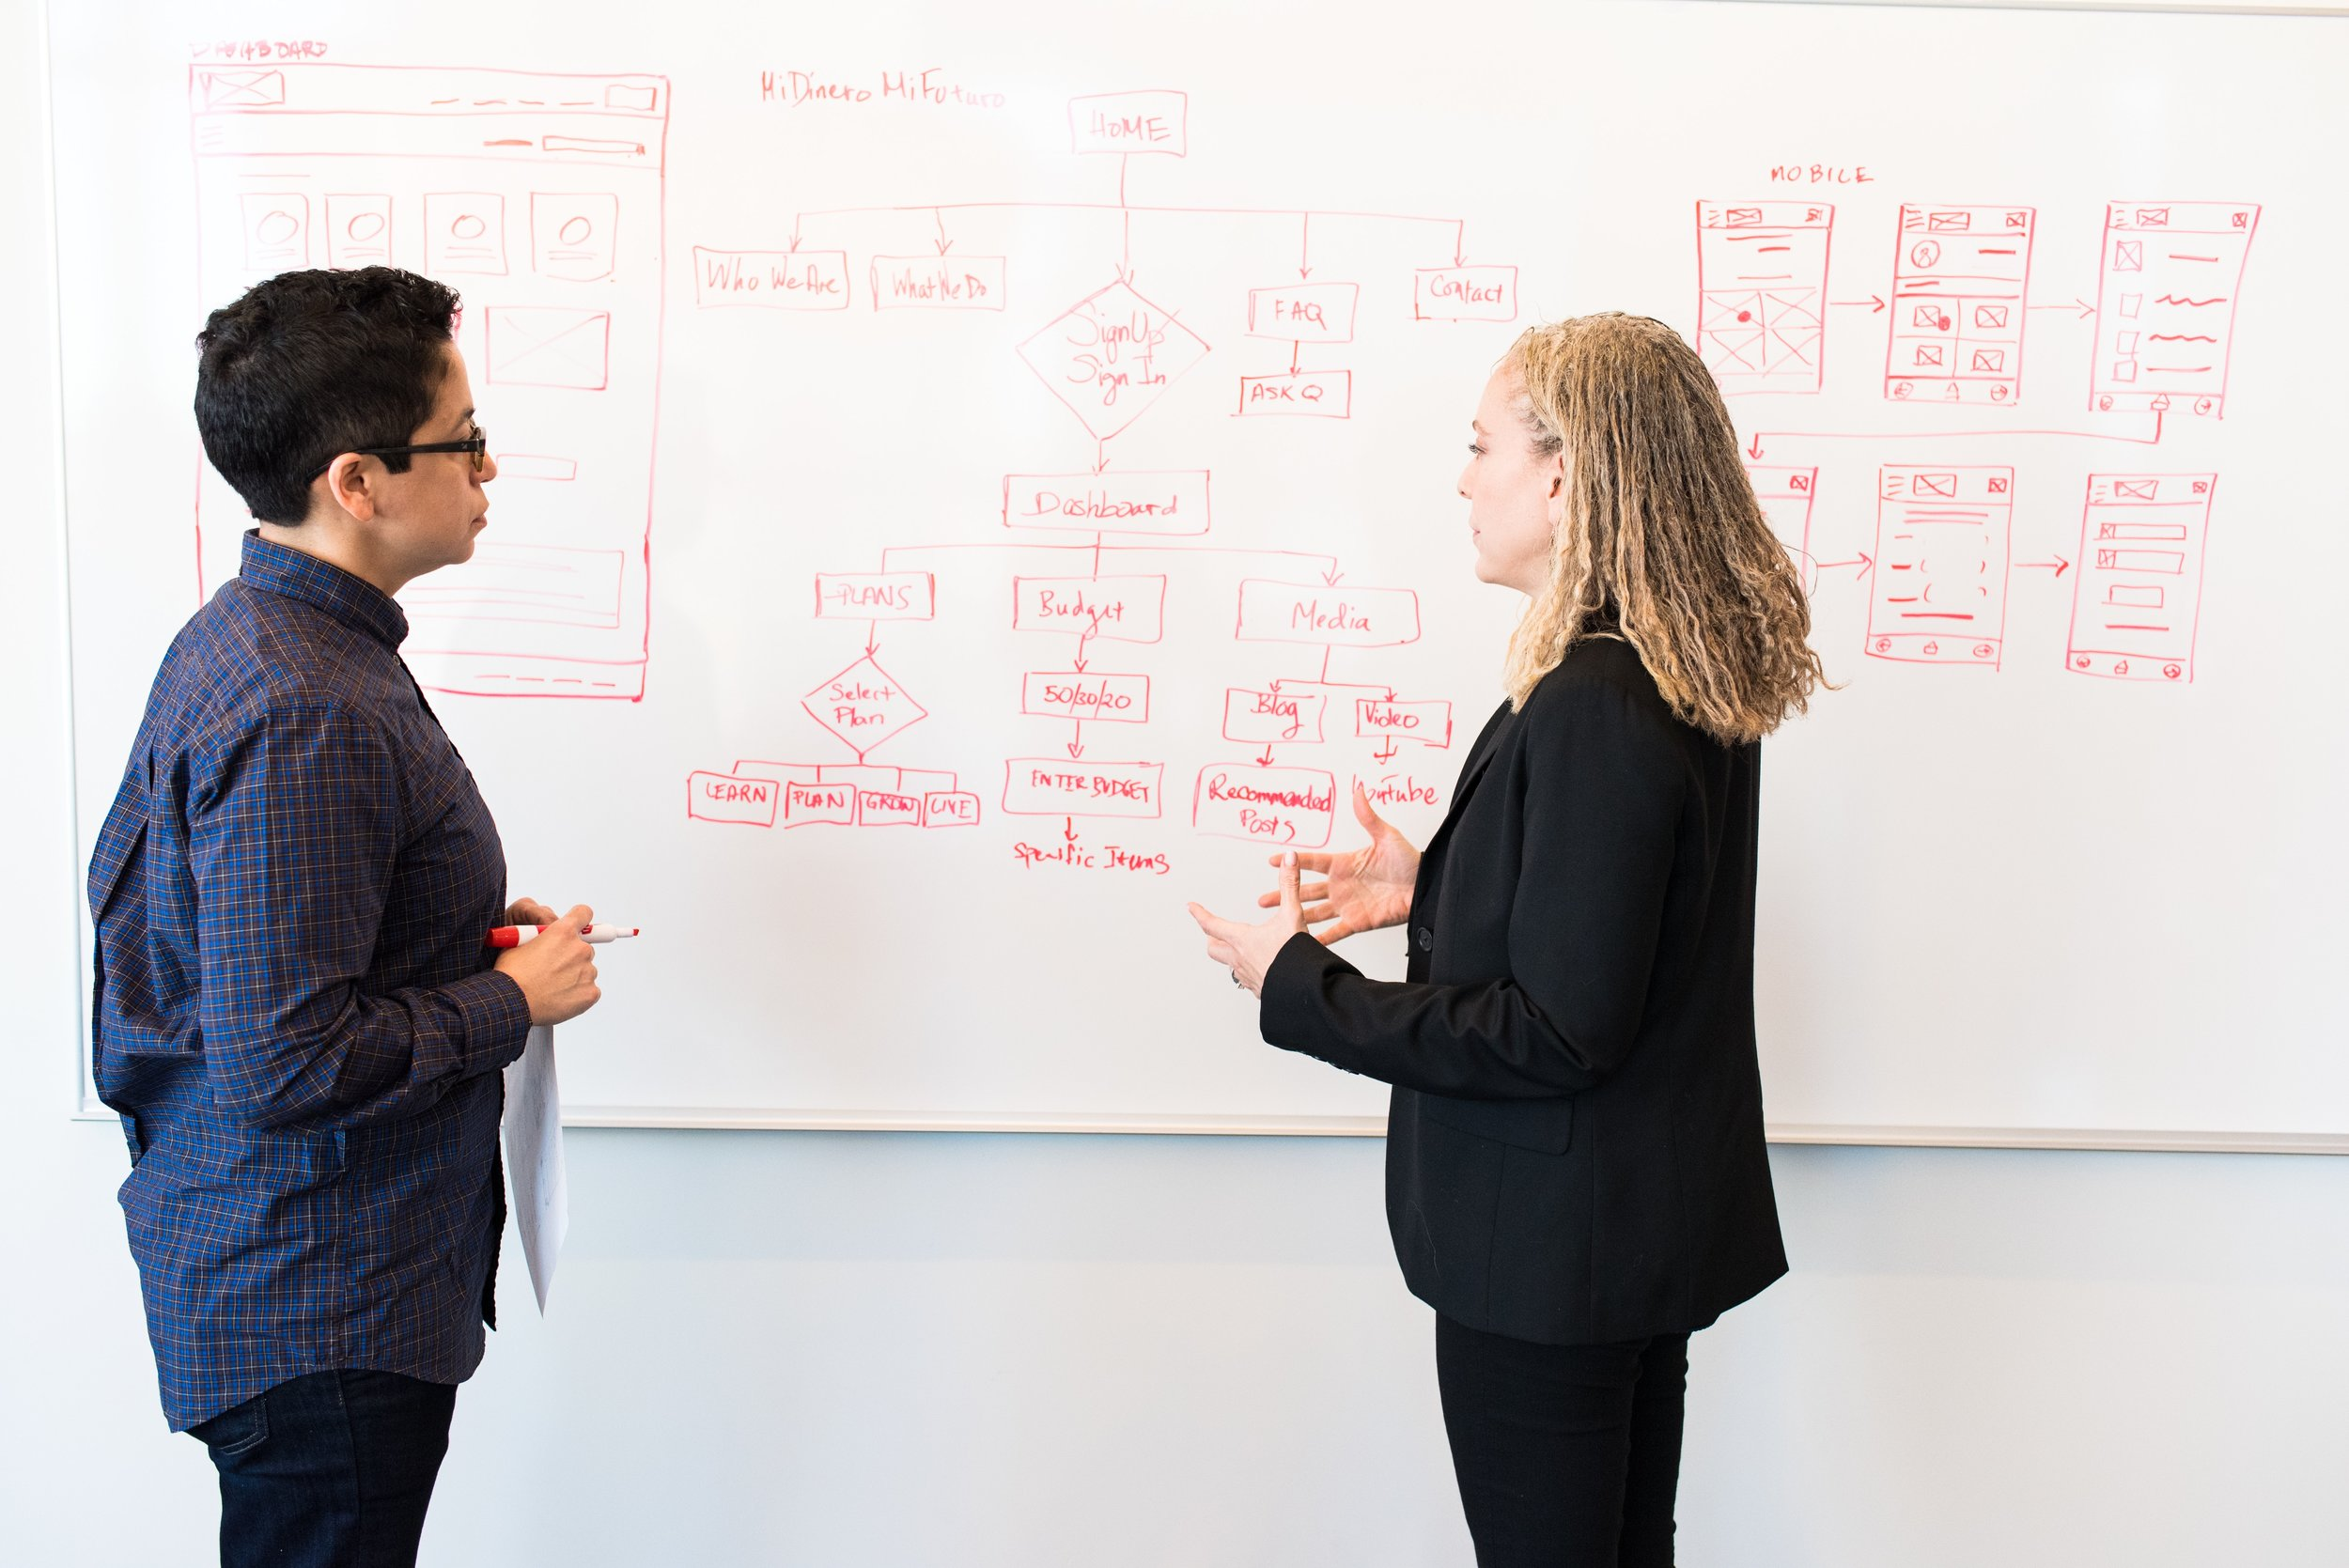 leadership-coaching-law-of-identity-teamwork-training-Minneapolis.jpg